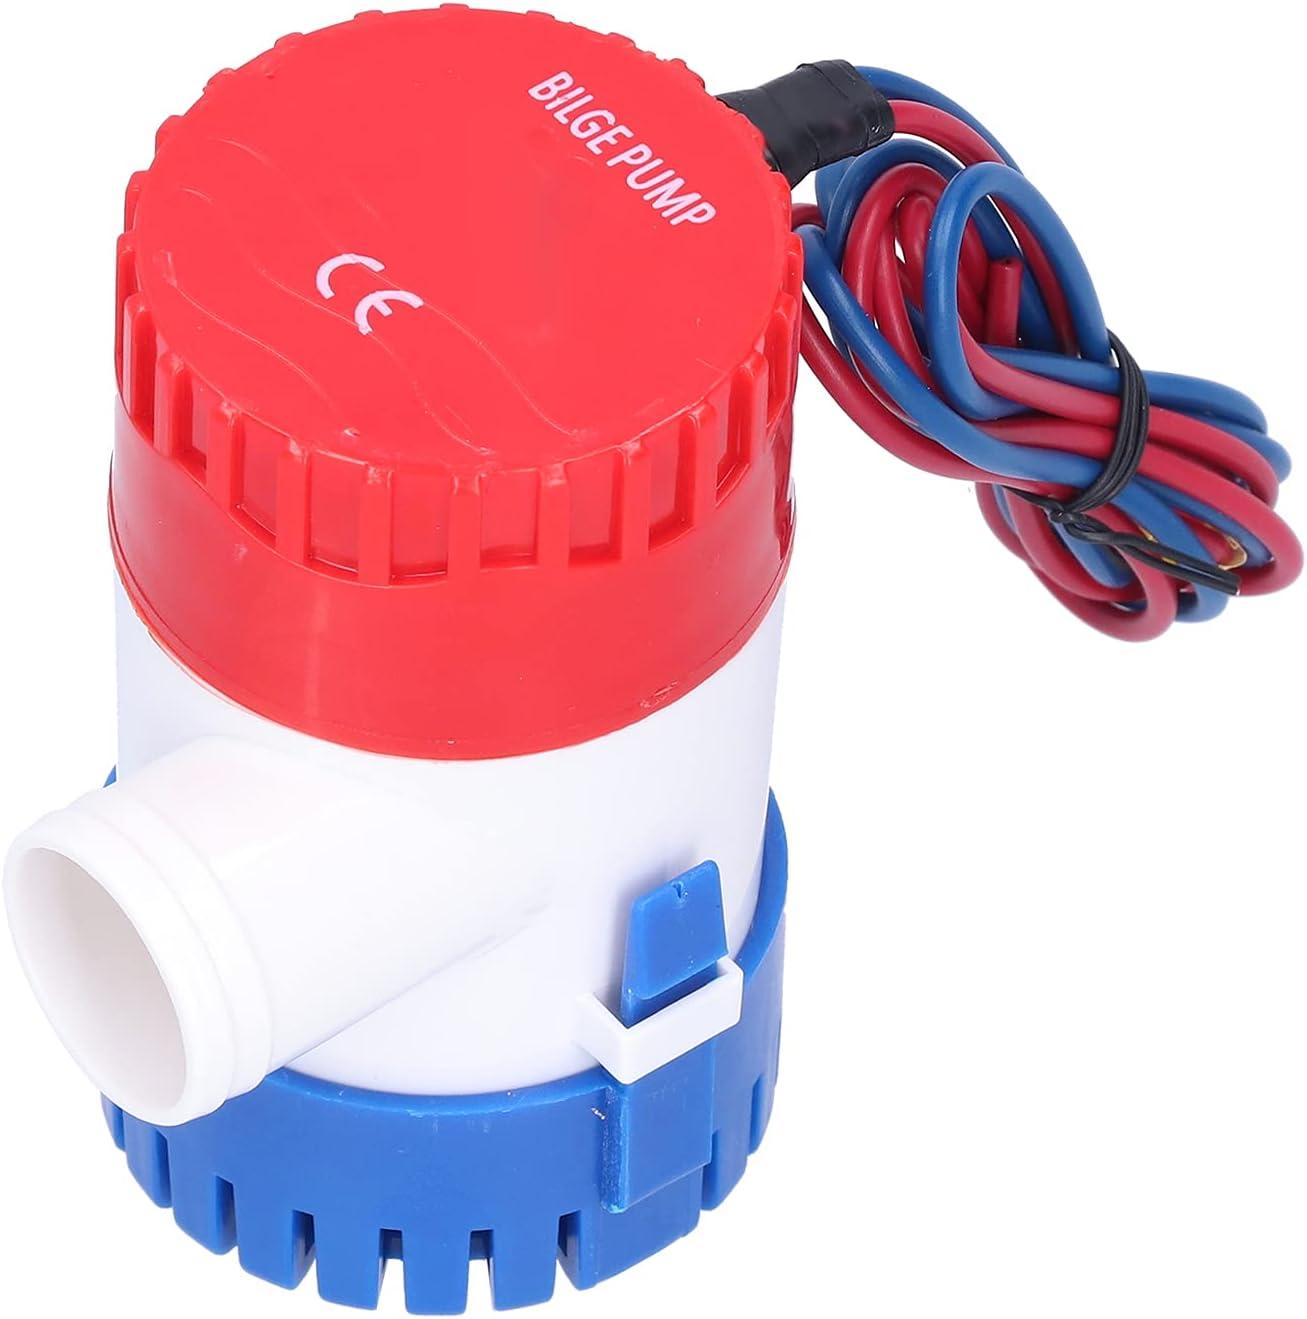 Bomba de sentina de 12V / 24V 350/500/750 / 1100GPH, bomba de sentina de bajo ruido, bomba sumergible pequeña eléctrica con interruptor semiautomático para drenaje que proporciona energía(12V-500GPH)